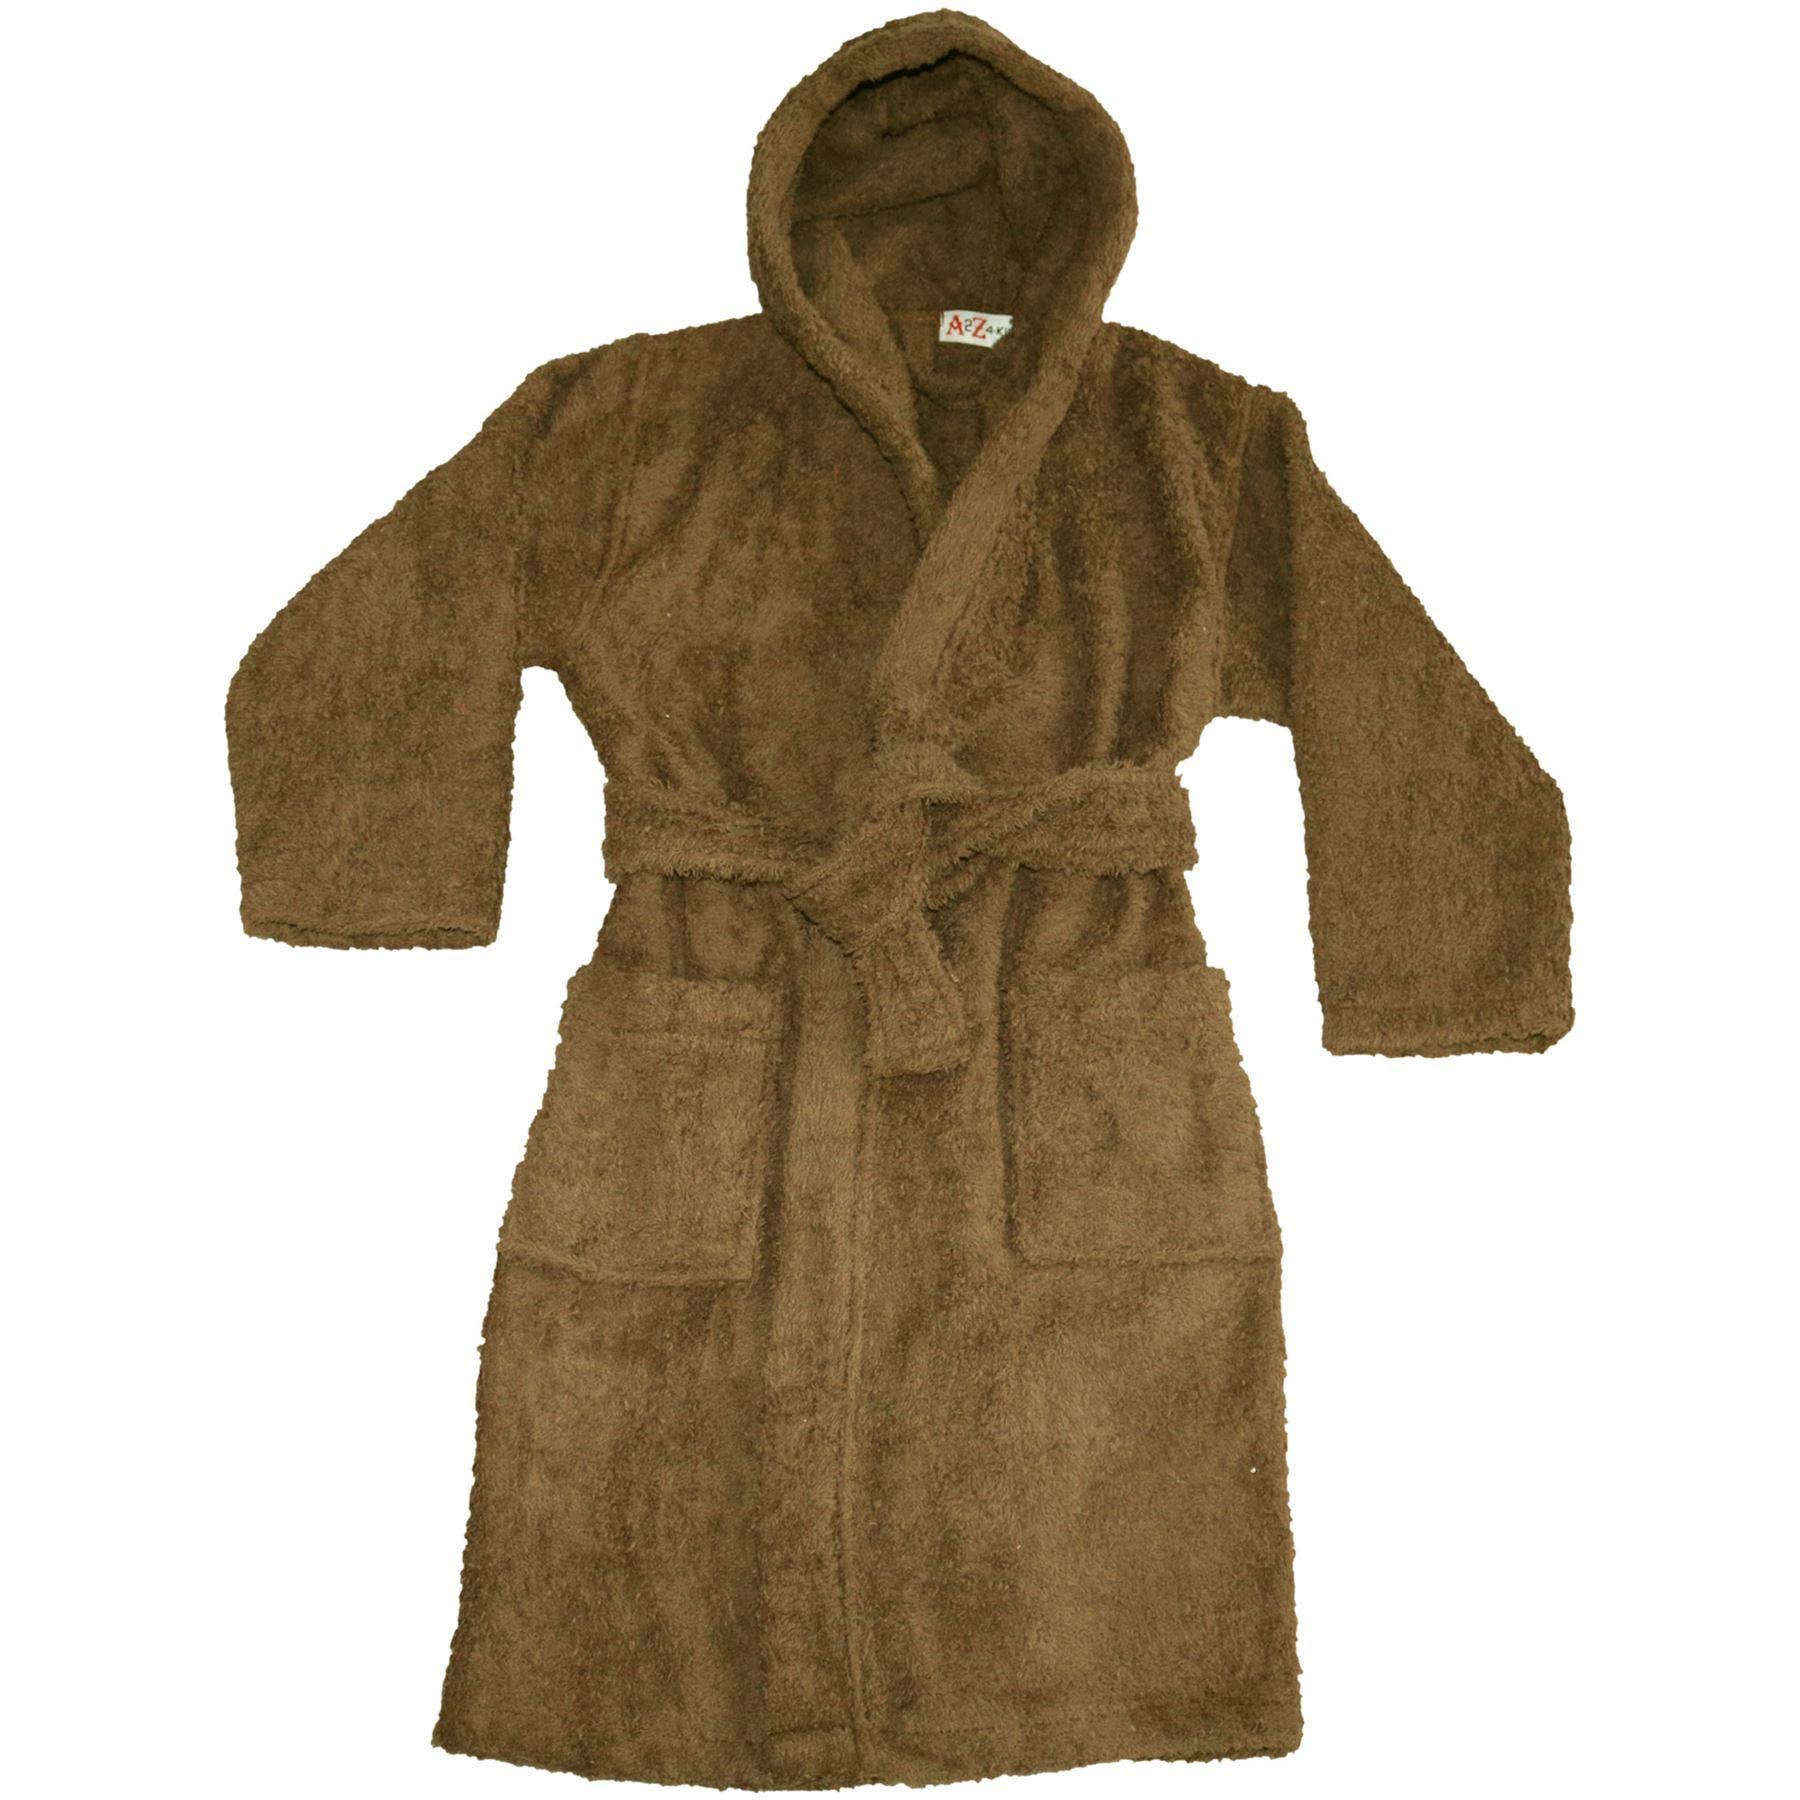 715a2a8870dac Kids Girls Boys Cotton Soft Terry Hooded Bathrobe Luxury Dressing ...